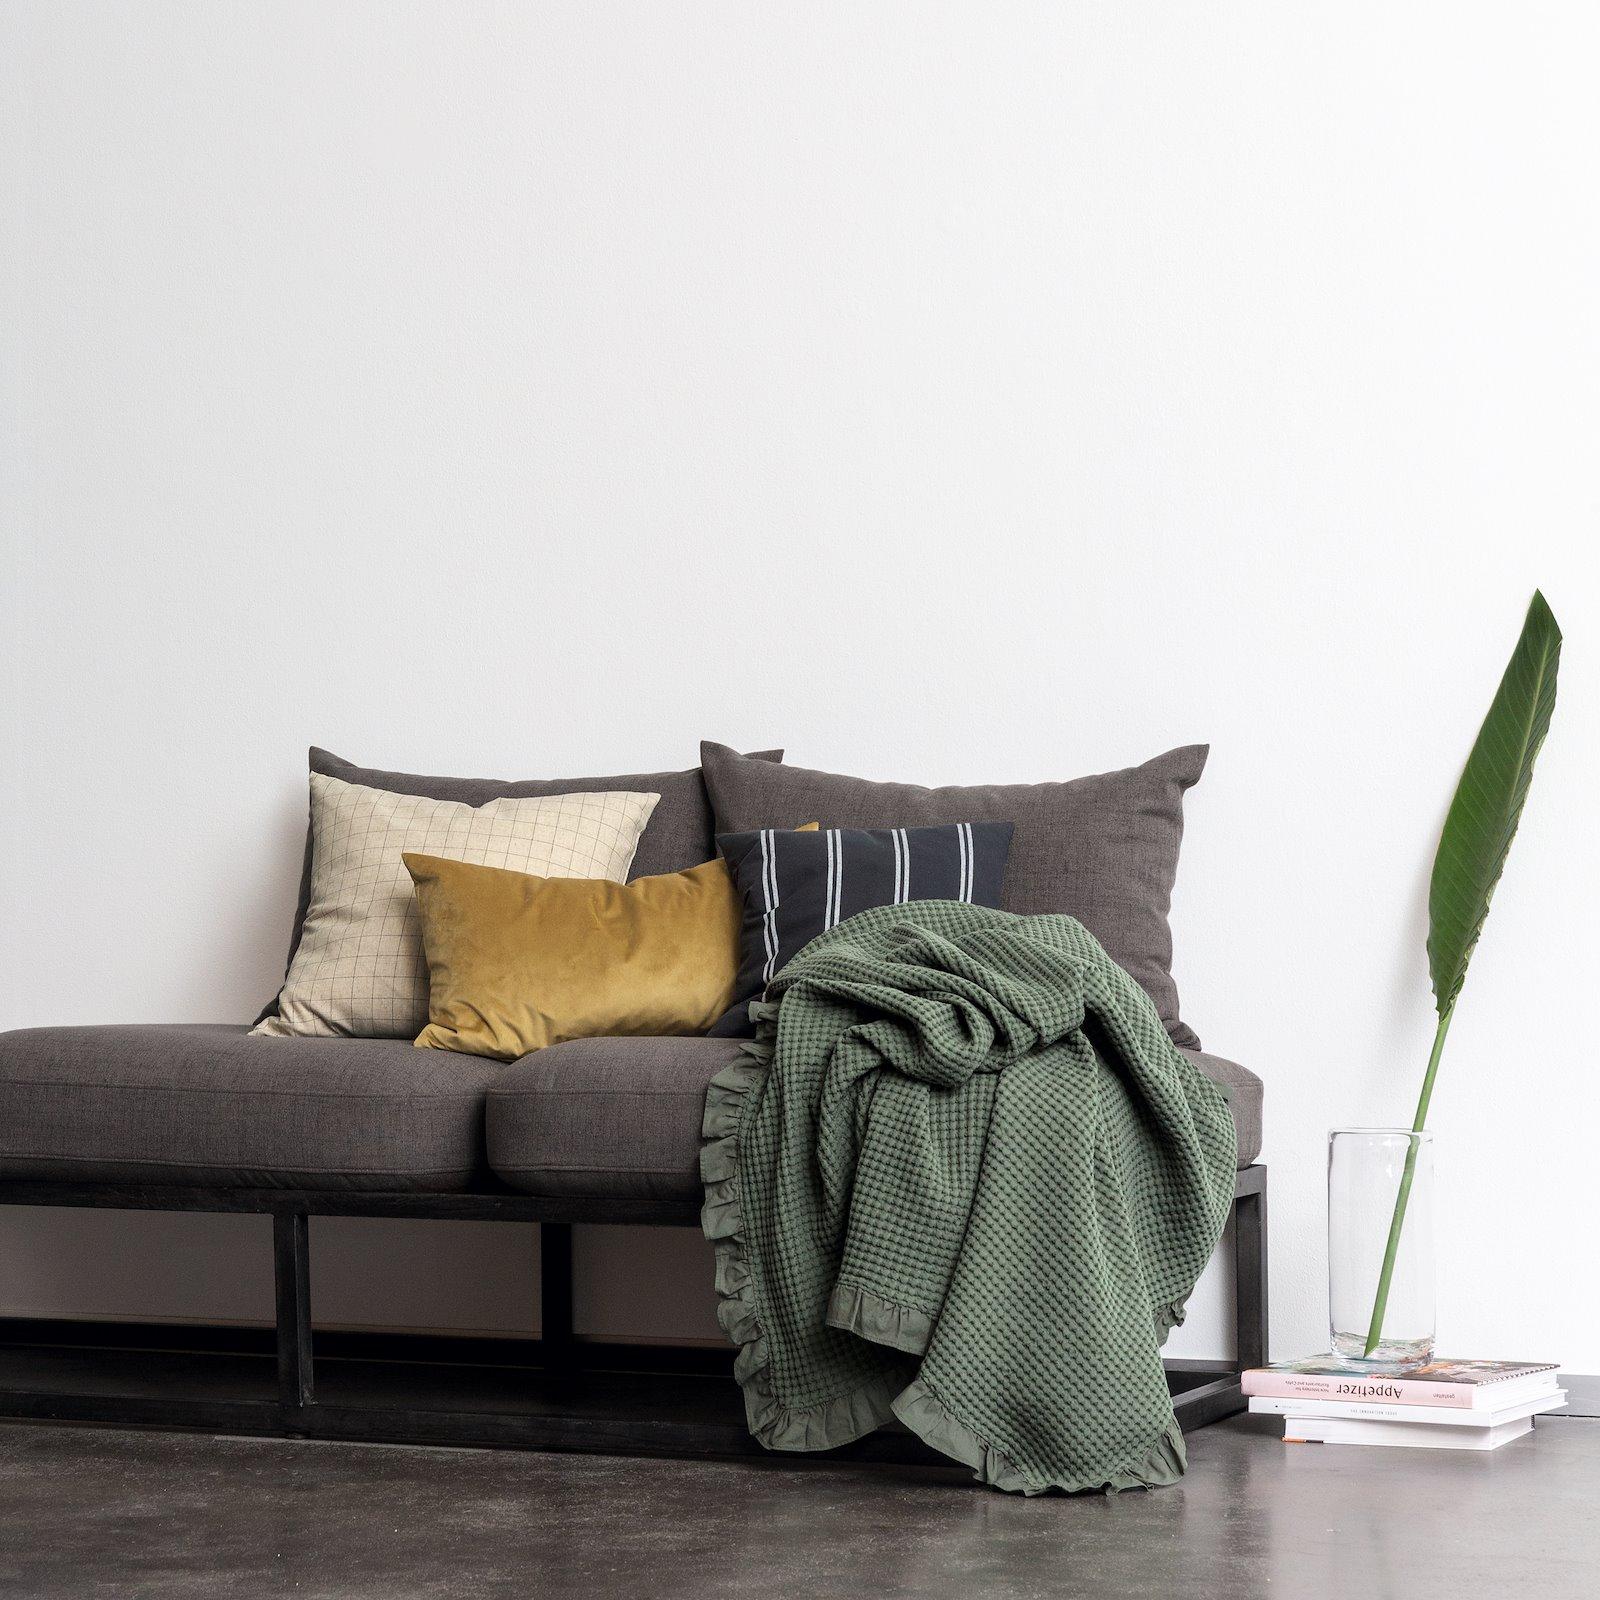 Woven yarn dyed black/off white stripe 824150_816260_824166_816256_501886_DIY8020_4336_bundle